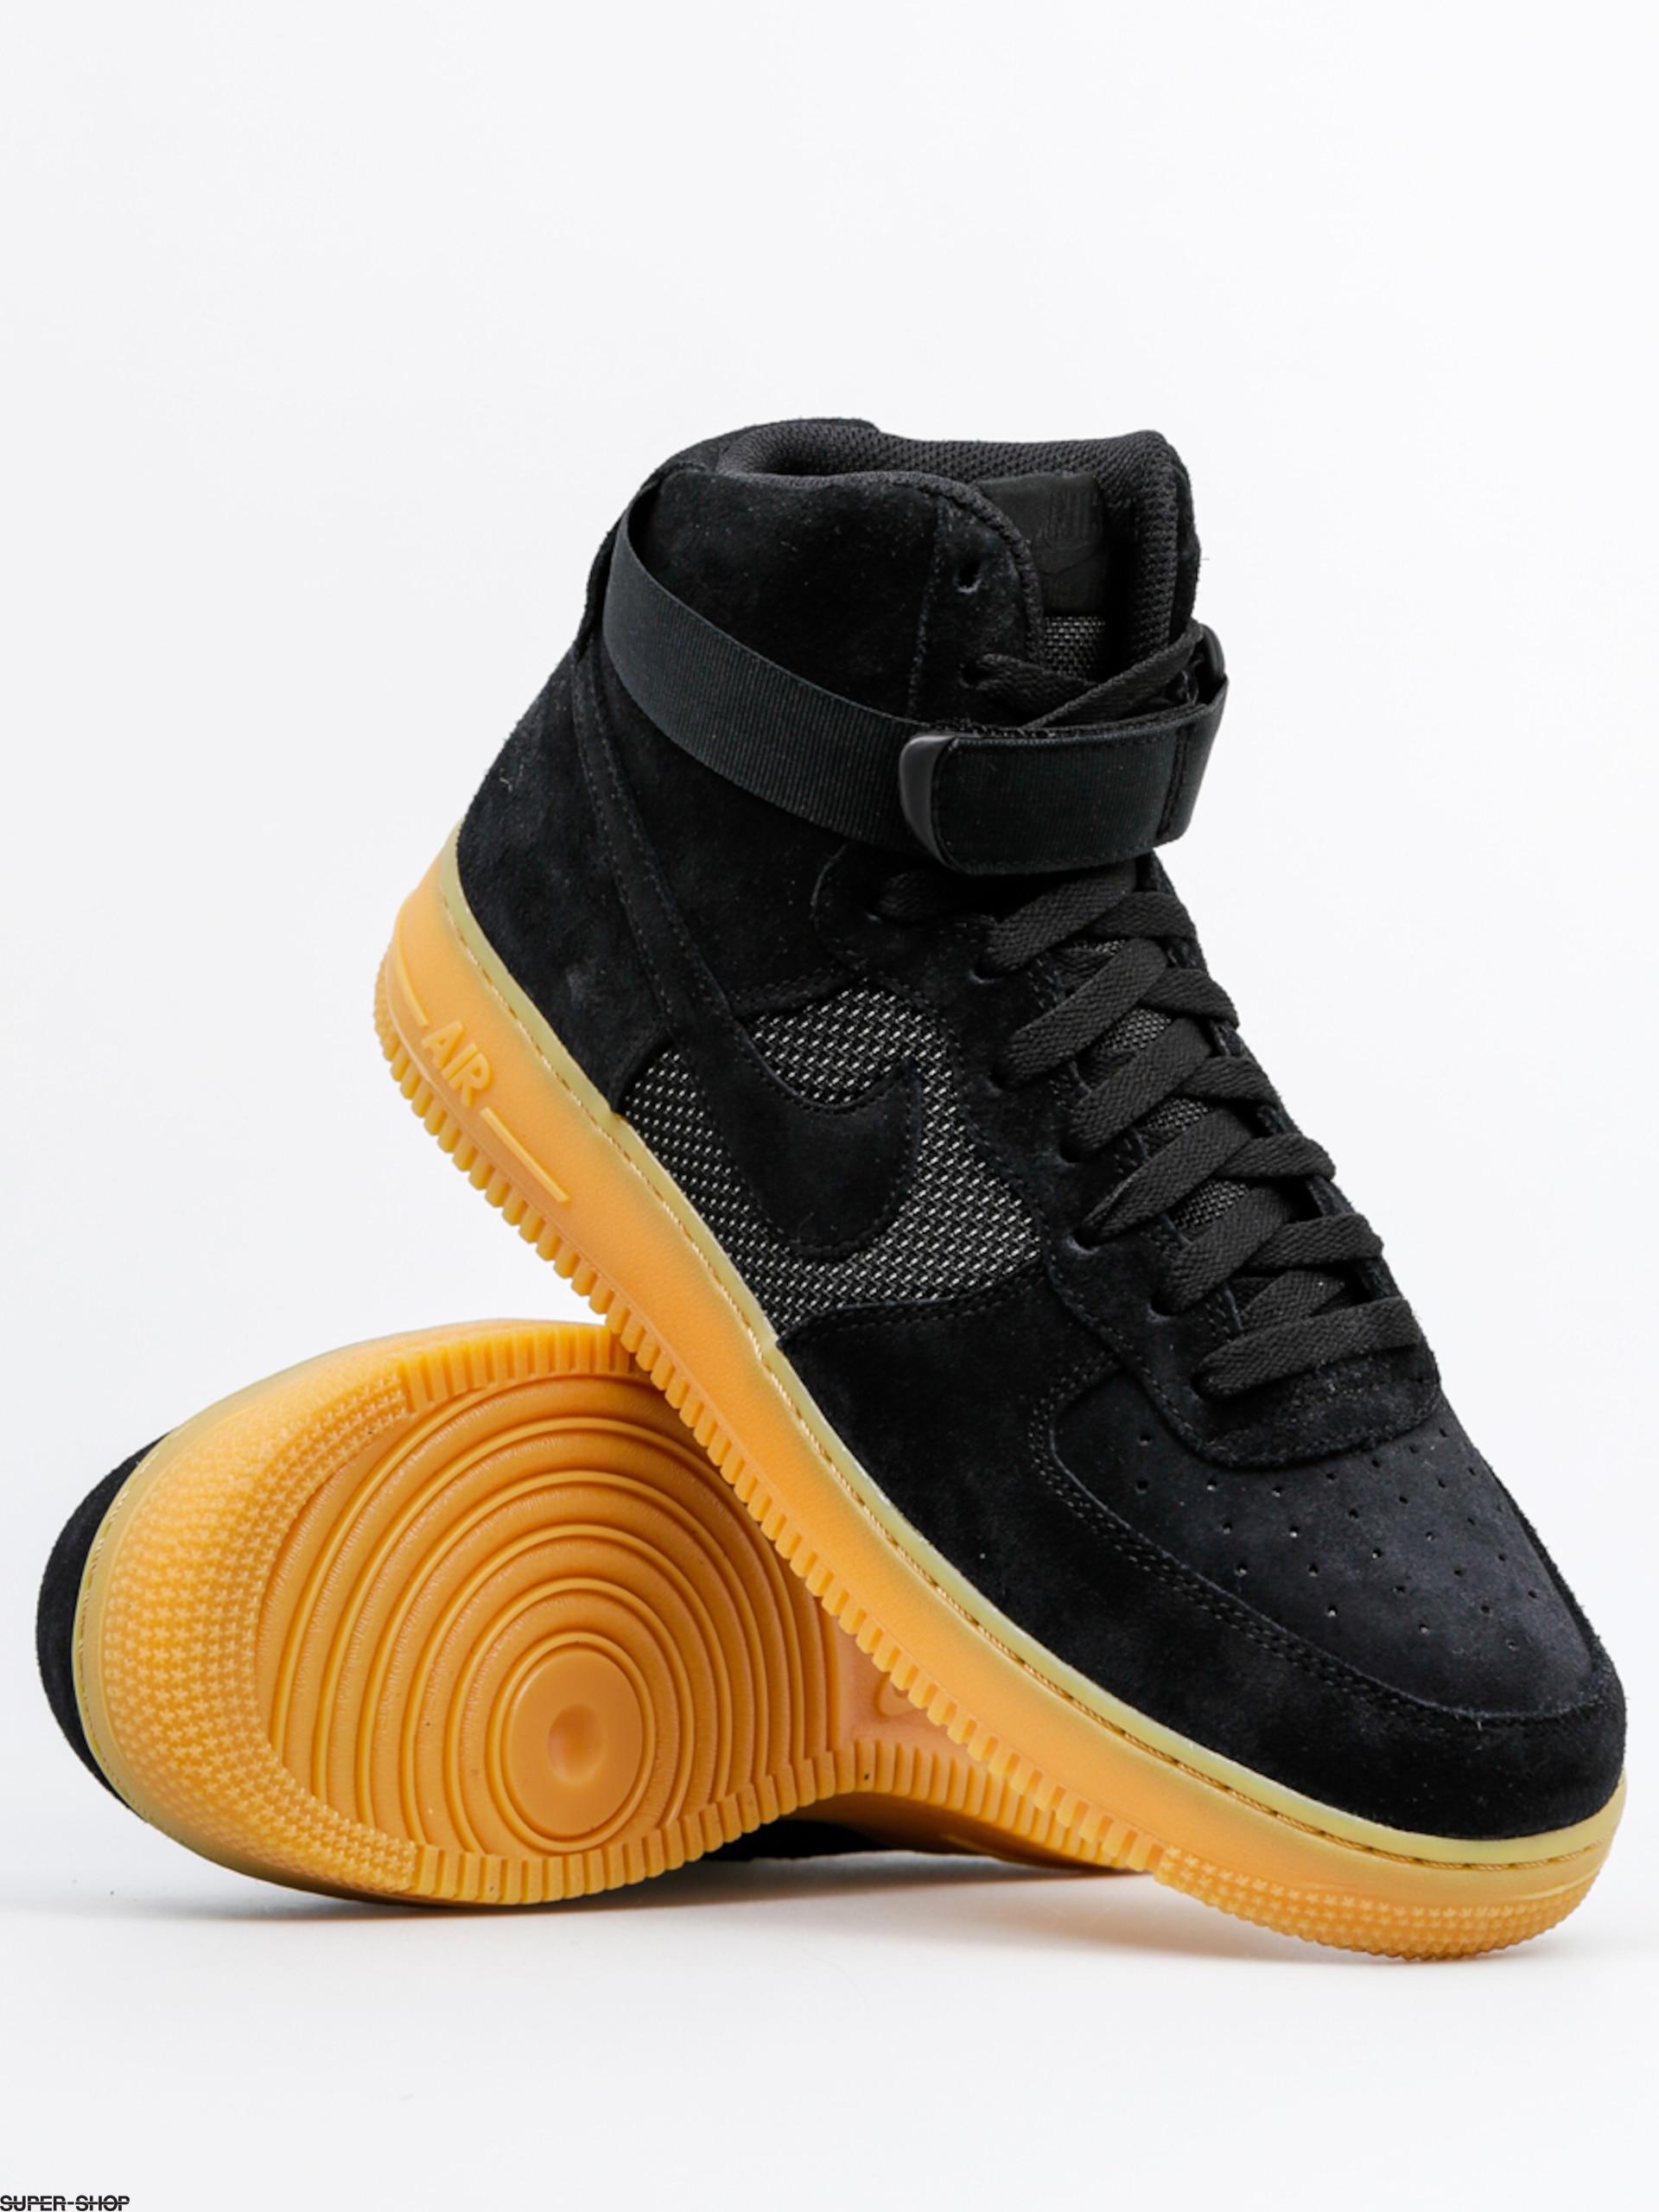 finest selection 62042 32b92 Nike Shoes Air Force 1 High 07 Lv8 (black black gum light brown)